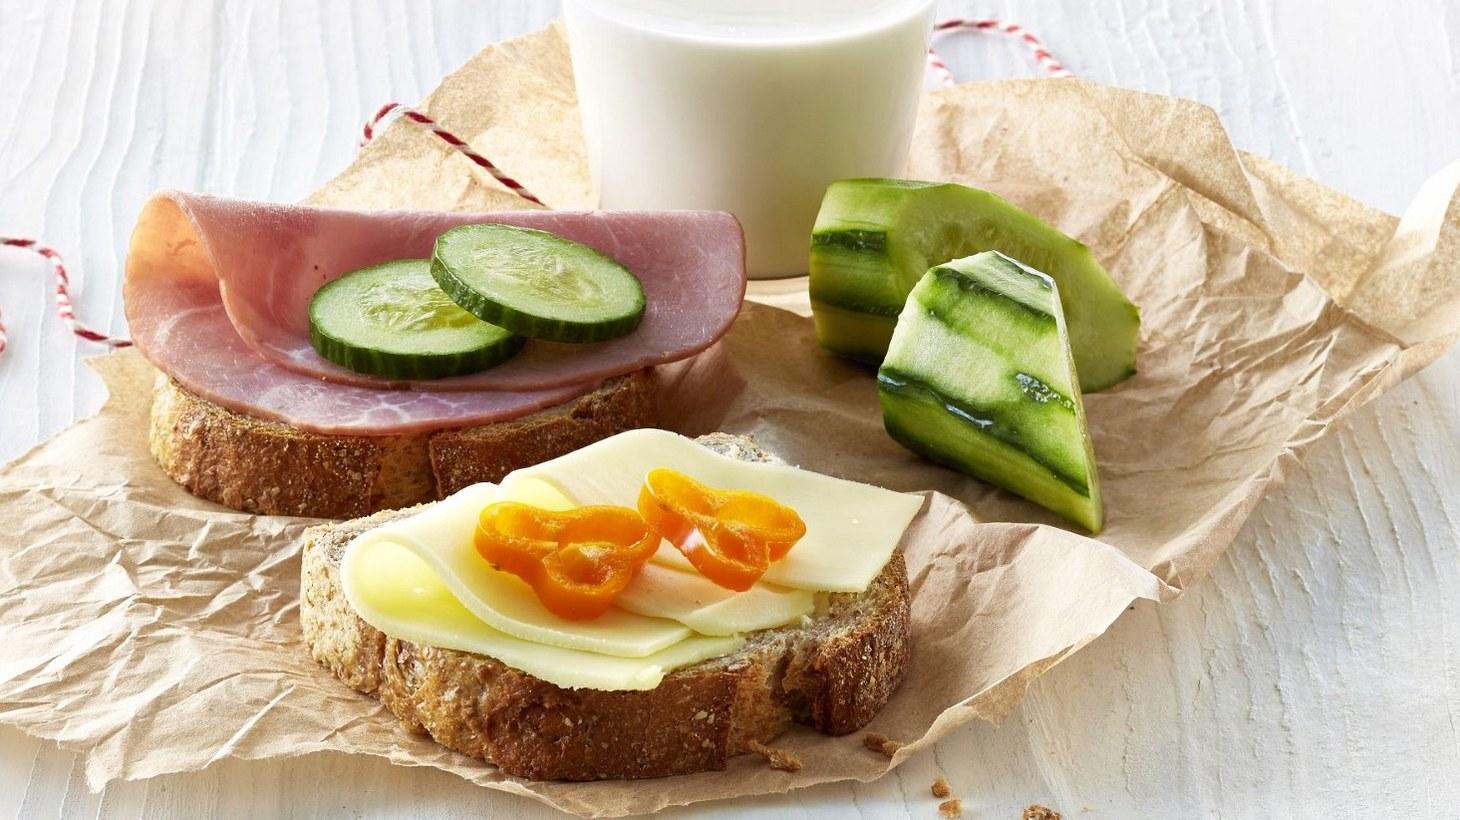 Matpakke, or the Norwegian art of packed lunch.